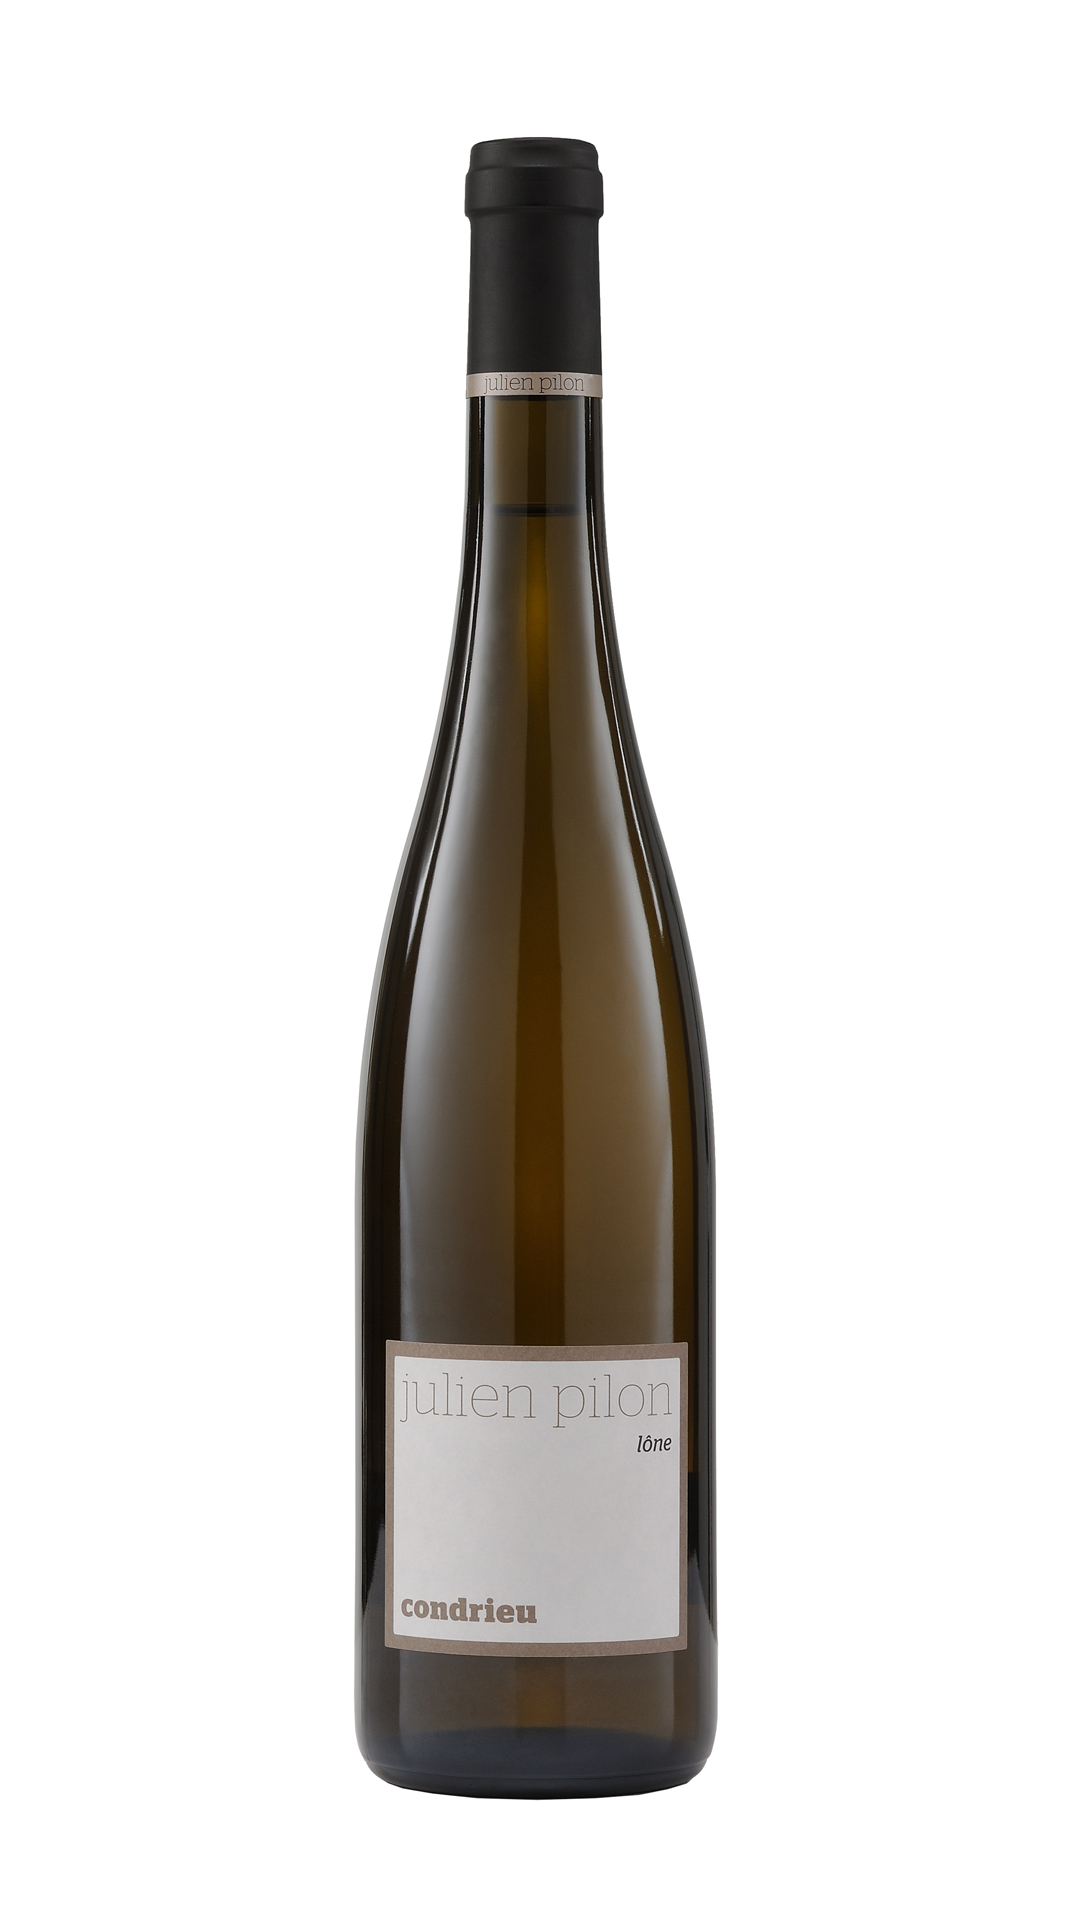 Cuvée AOC Condrieu Lône vin blanc